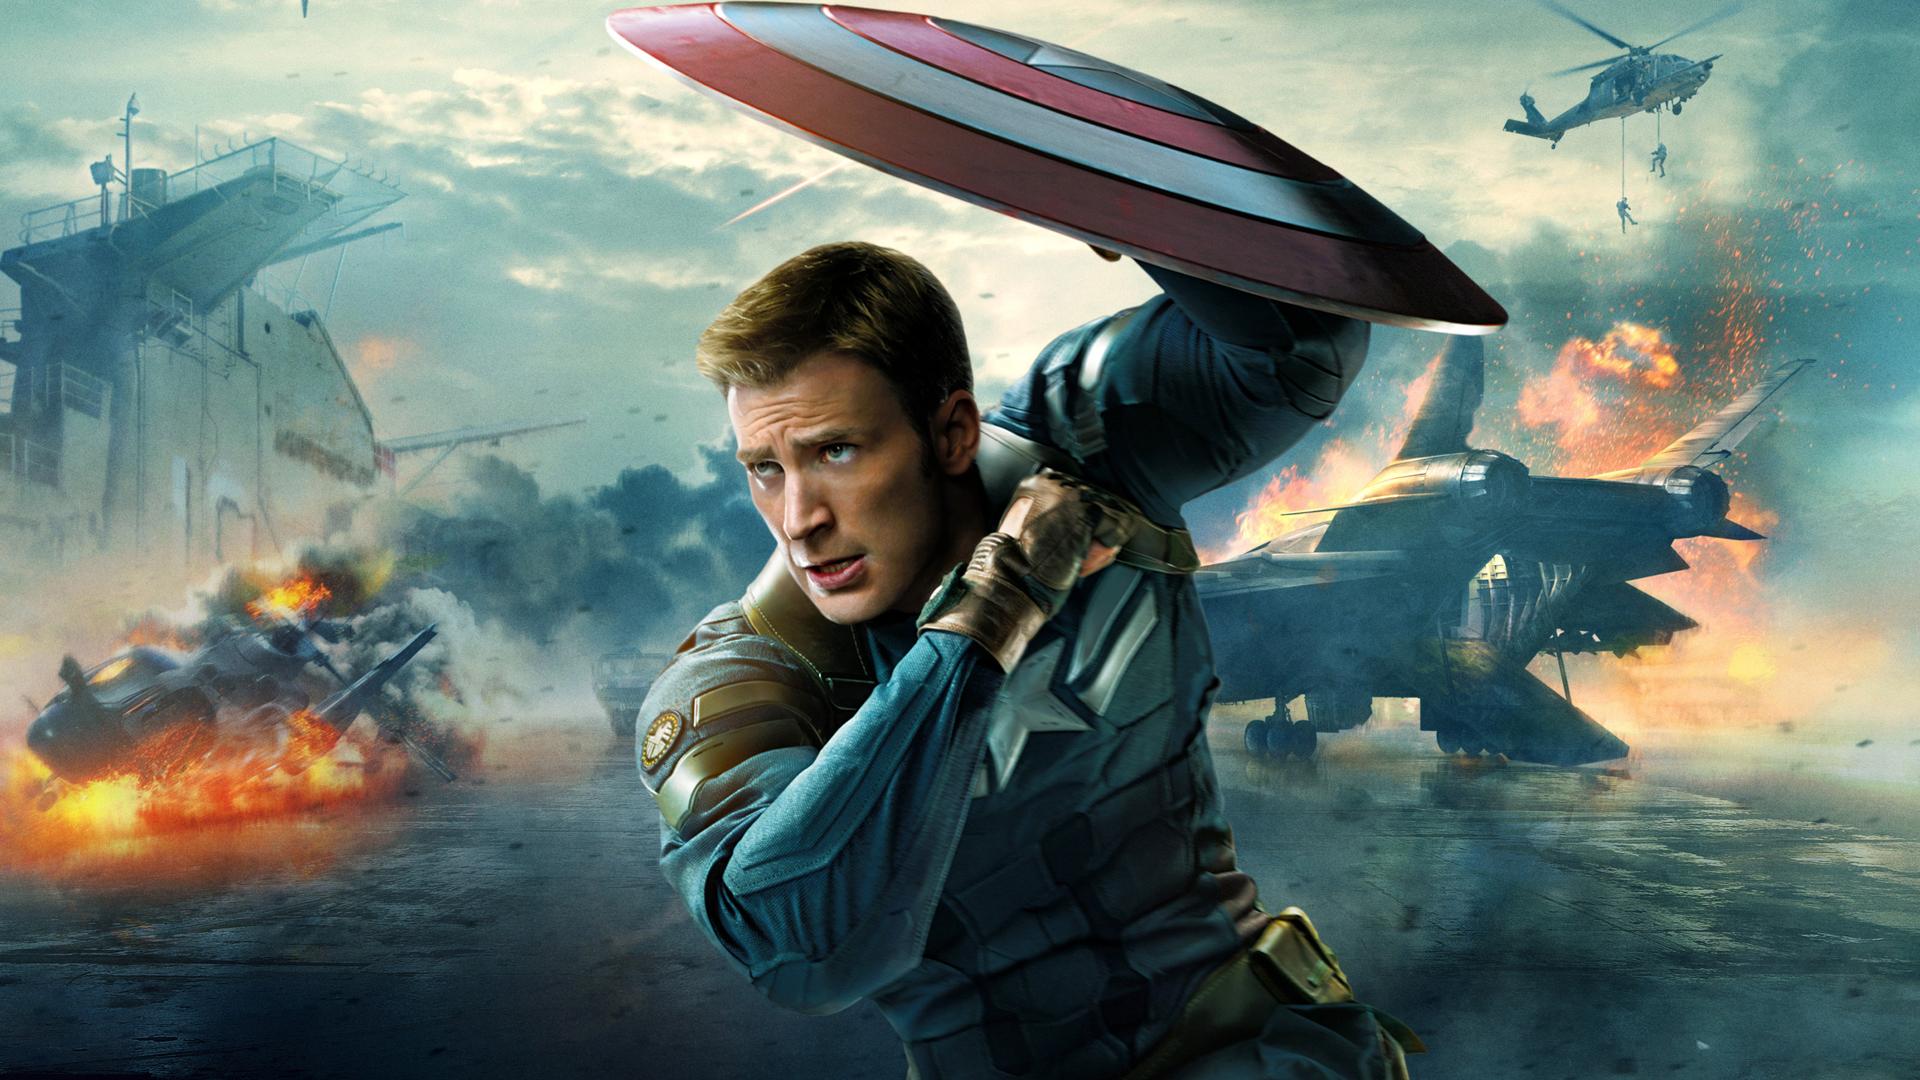 Captain America TWS Wallpaper 1920x1080 by sachso74 1920x1080